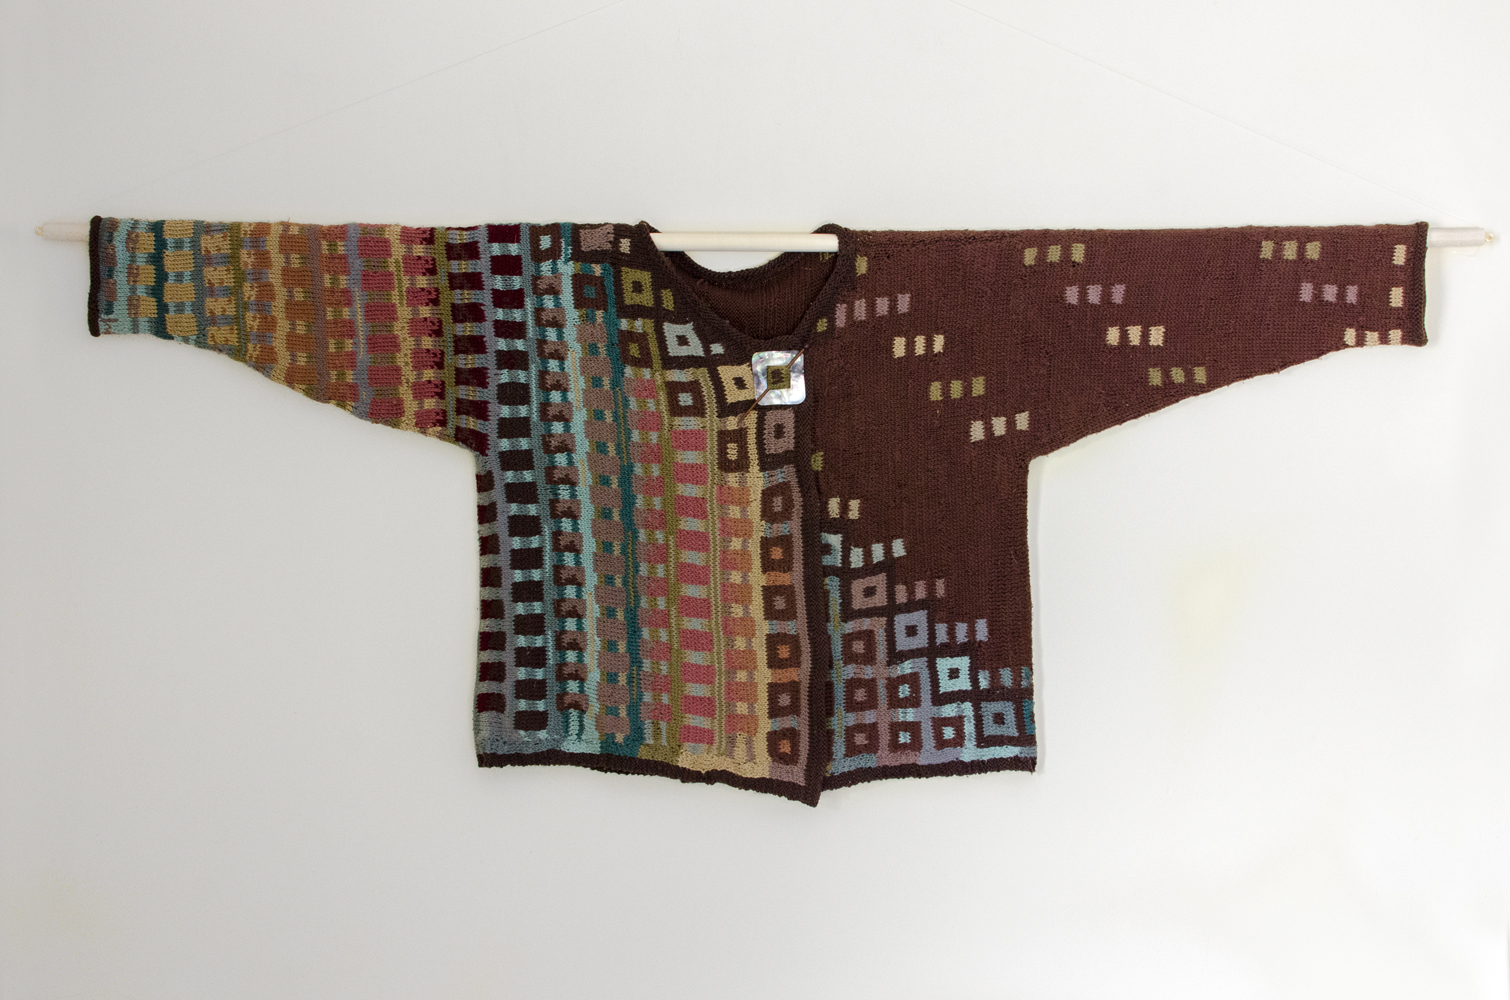 sweater-5-front.jpg